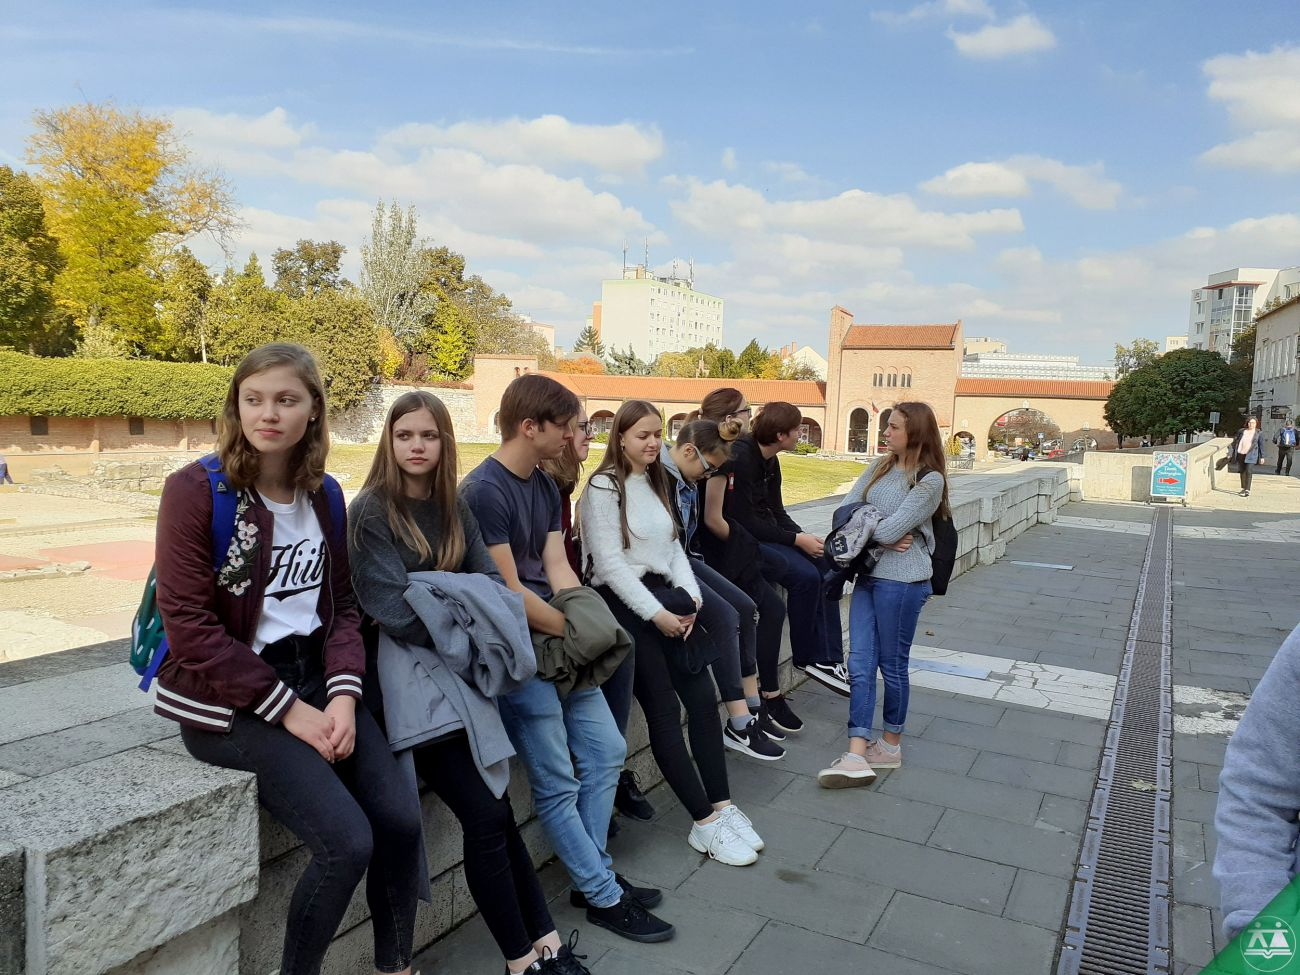 Strokovna-ekskurzija-v-Szekesfehervar-2019-035